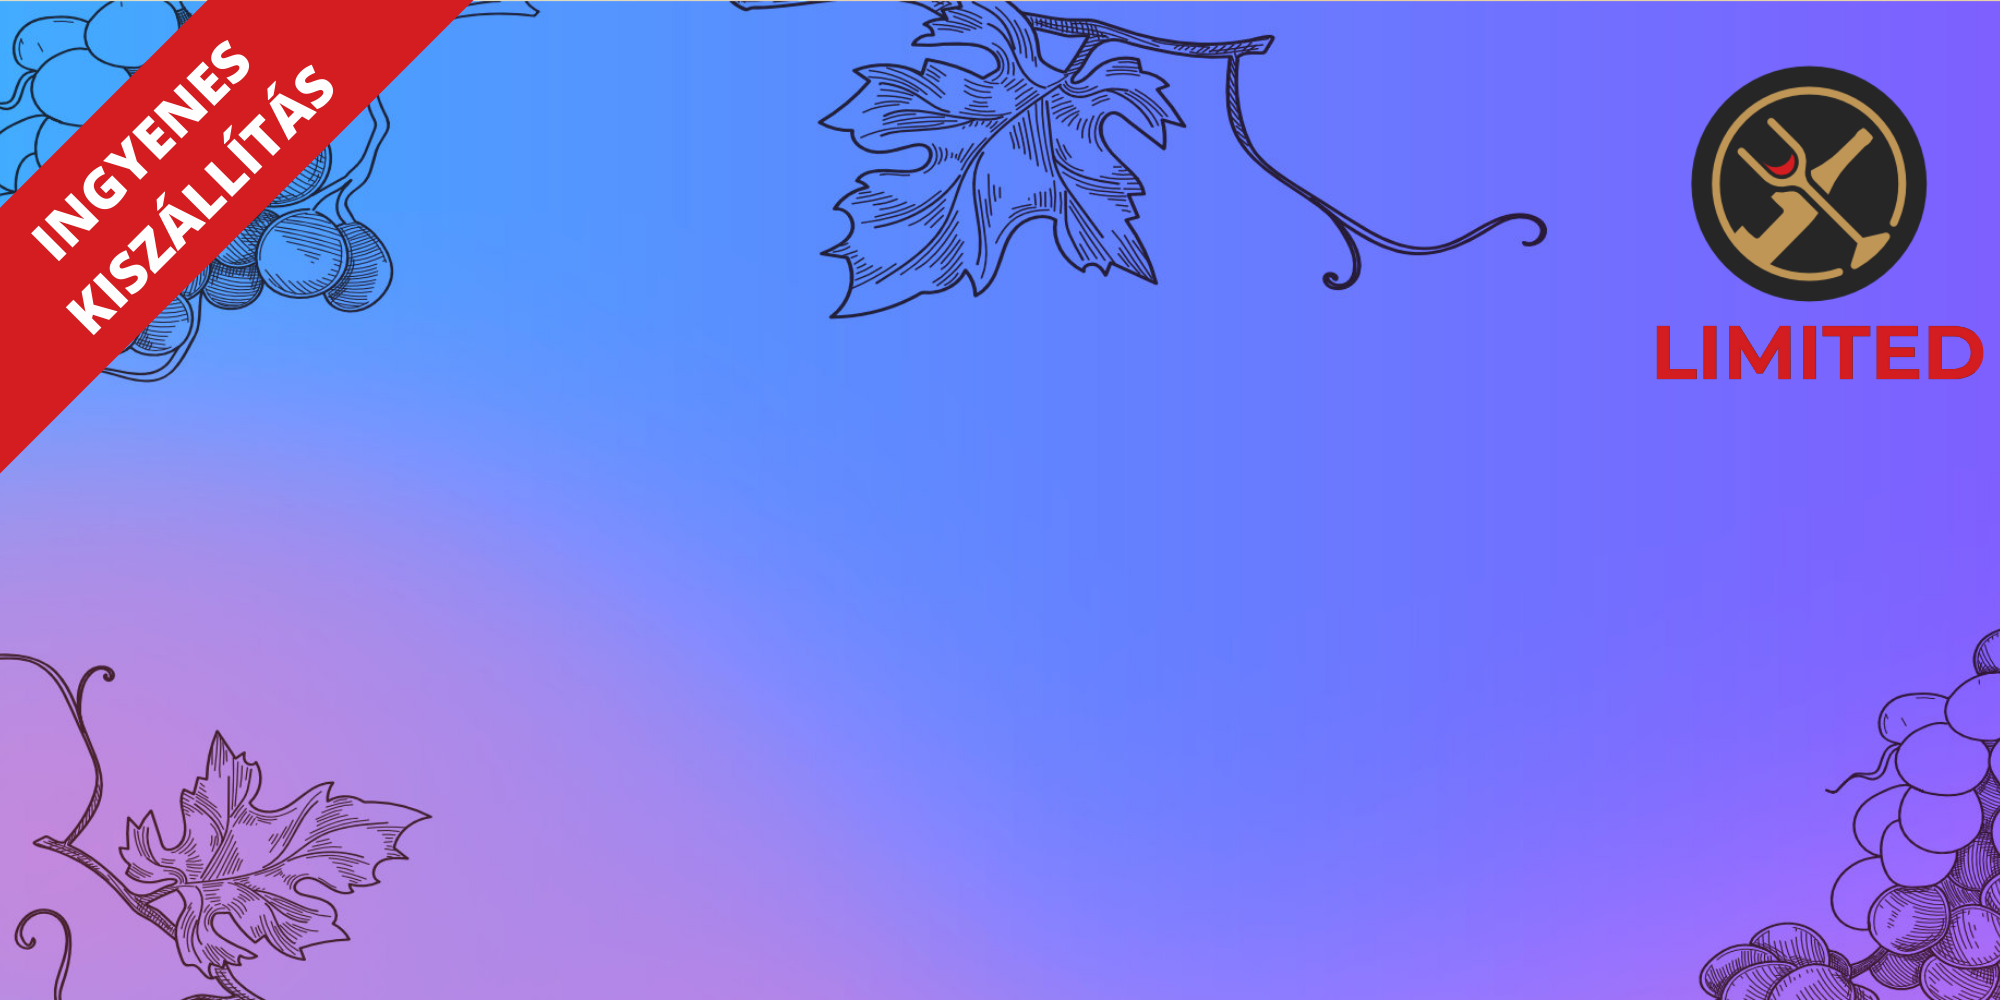 Prémium Kékfrankosok